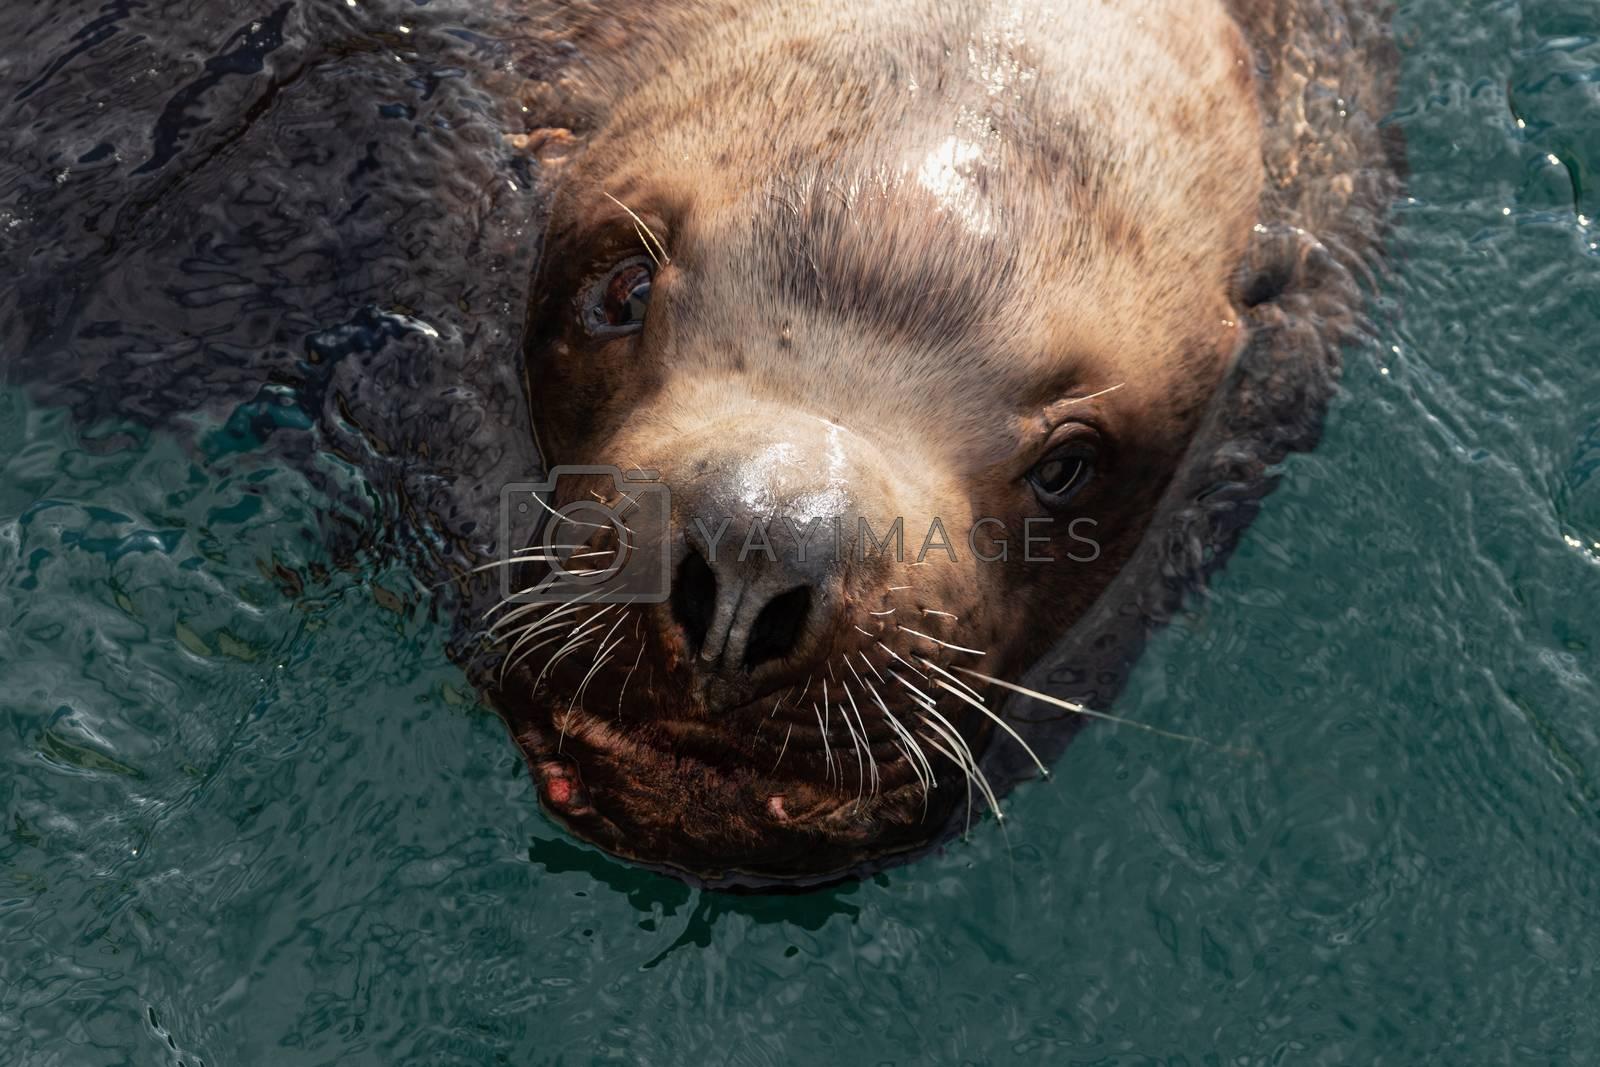 Portrait of wild sea animal Steller Sea Lion or Northern Sea Lion (Eumetopias Jubatus) swims in cold waves Pacific Ocean. Eurasia, Russian Far East, Kamchatka Peninsula, Avachinskaya Bay.